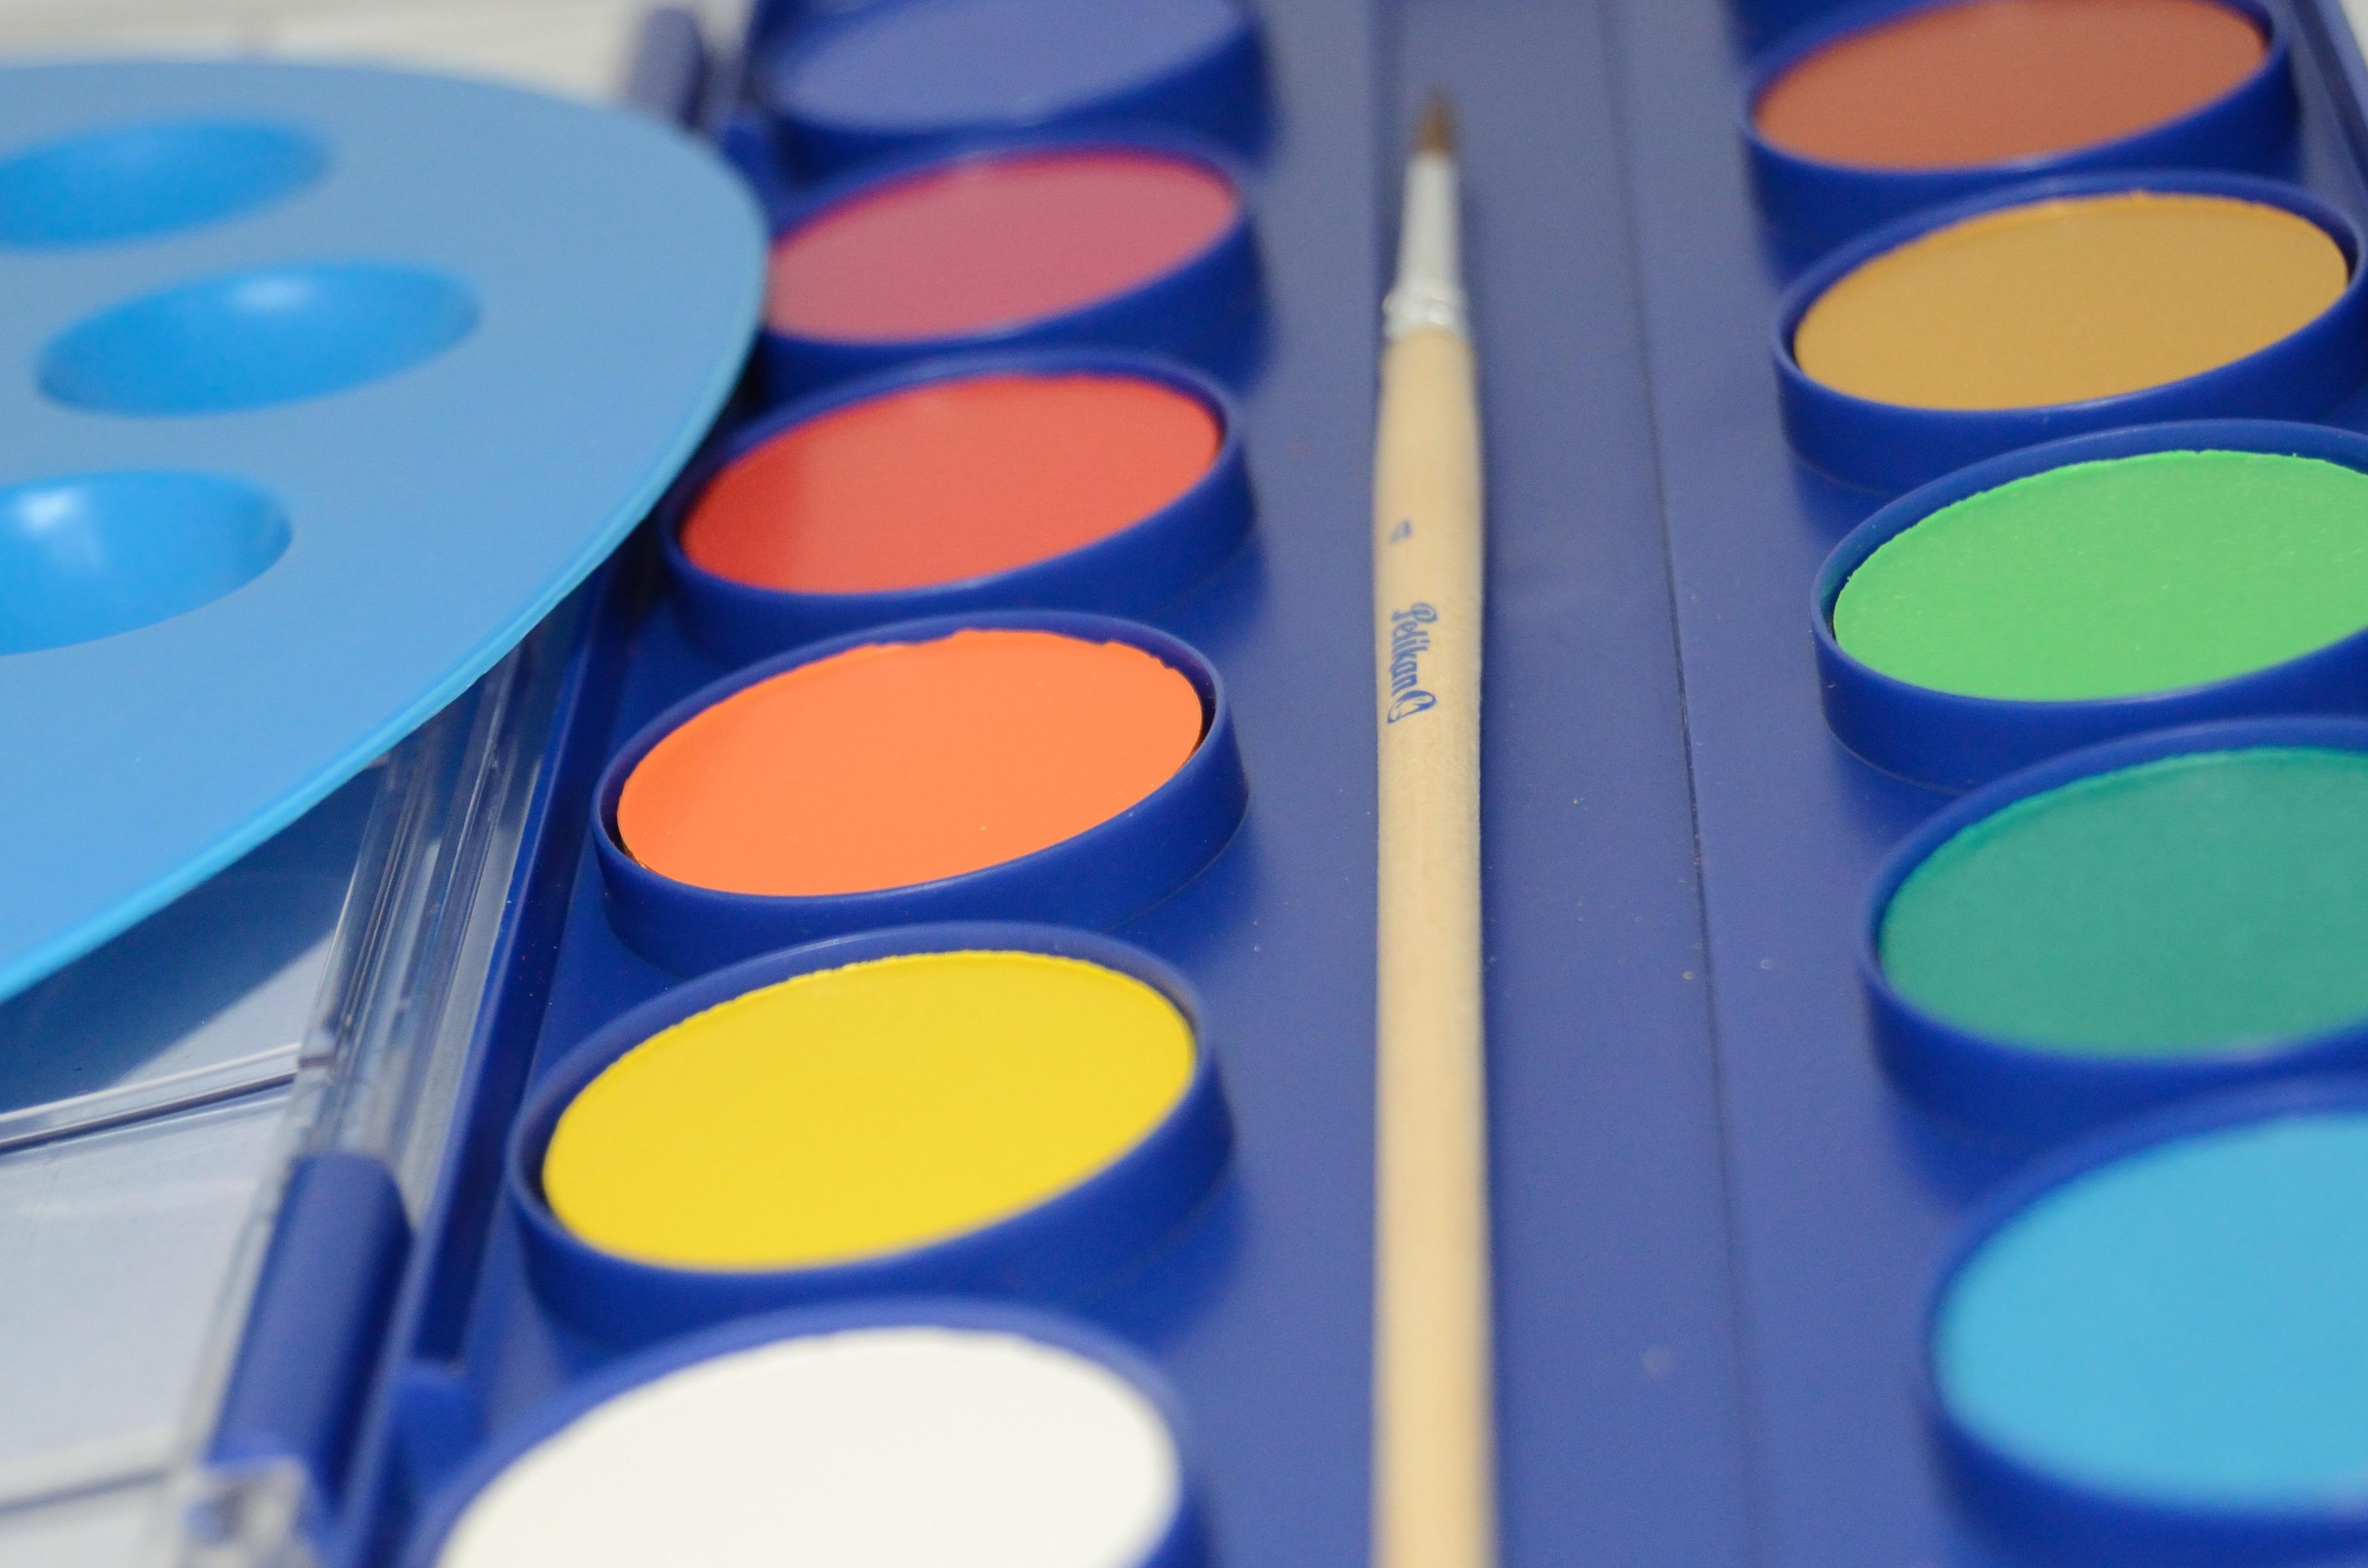 Gambar Kaca Jumlah Sikat Biru Kuning Lingkaran Lukisan Anak Anak Kesenangan Desain Taman Kanak Kanak Sekolah Bentuk Warna Cat 3779x2503 941477 Galeri Foto Pxhere